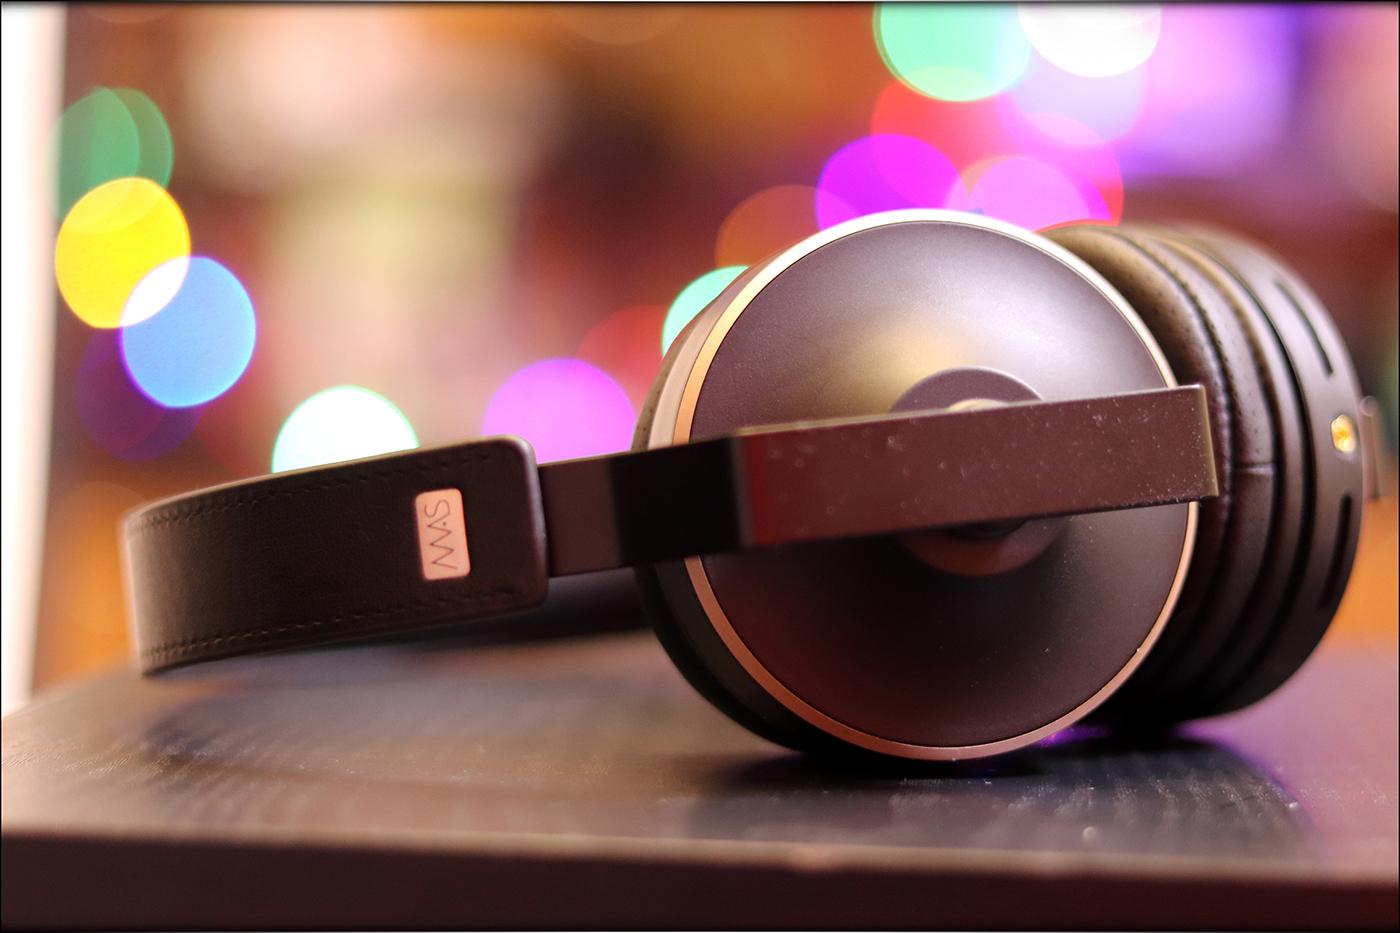 MAS-Audio-Science-XX-Headphones-Bluetooth-MMCX-Cable-X5h-Wireless-Headphones-Dynamic-Warm-Bass...jpg